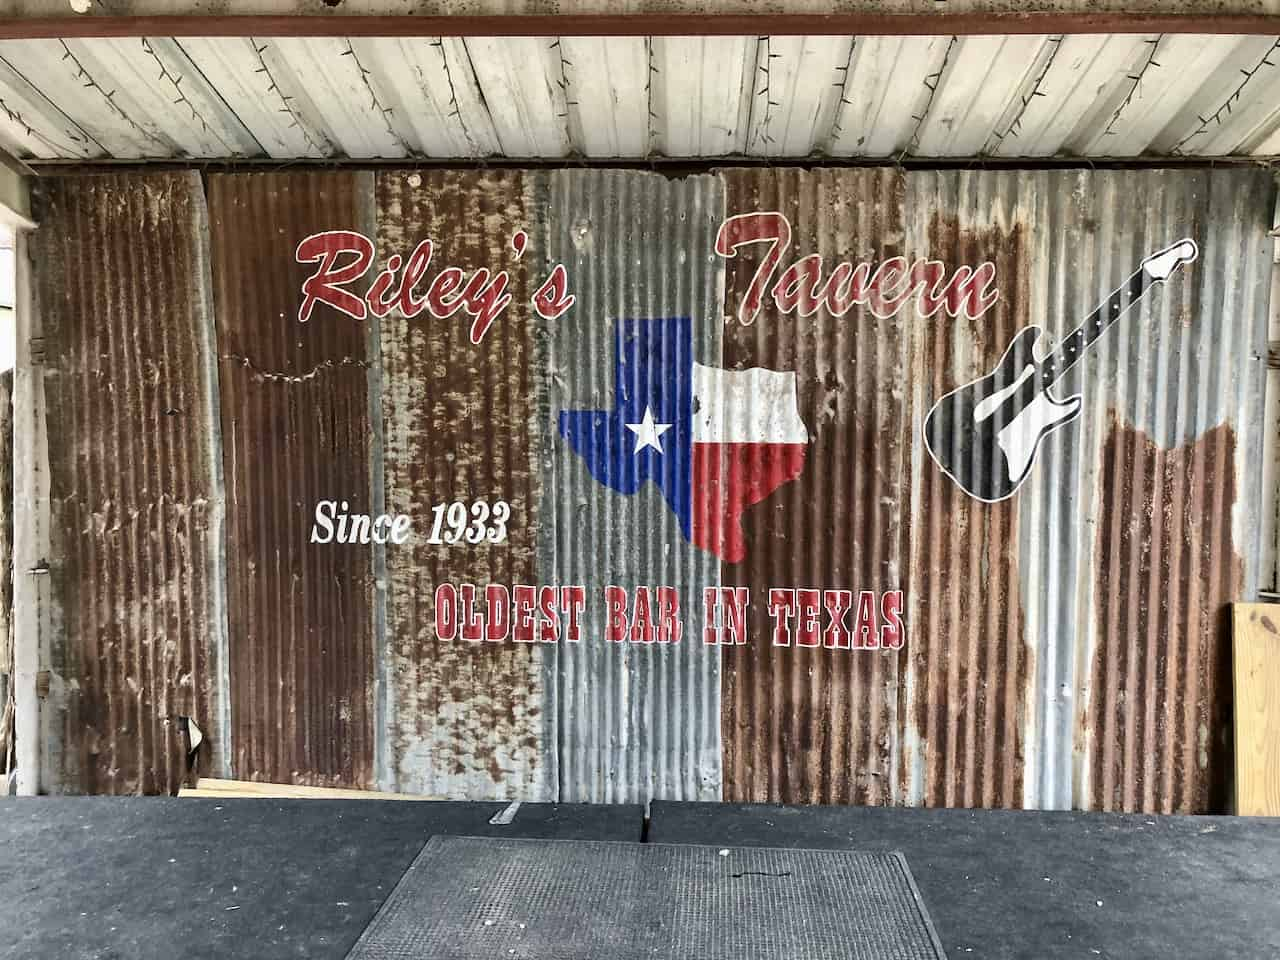 Top 10 Favorite Music Venues in Texas